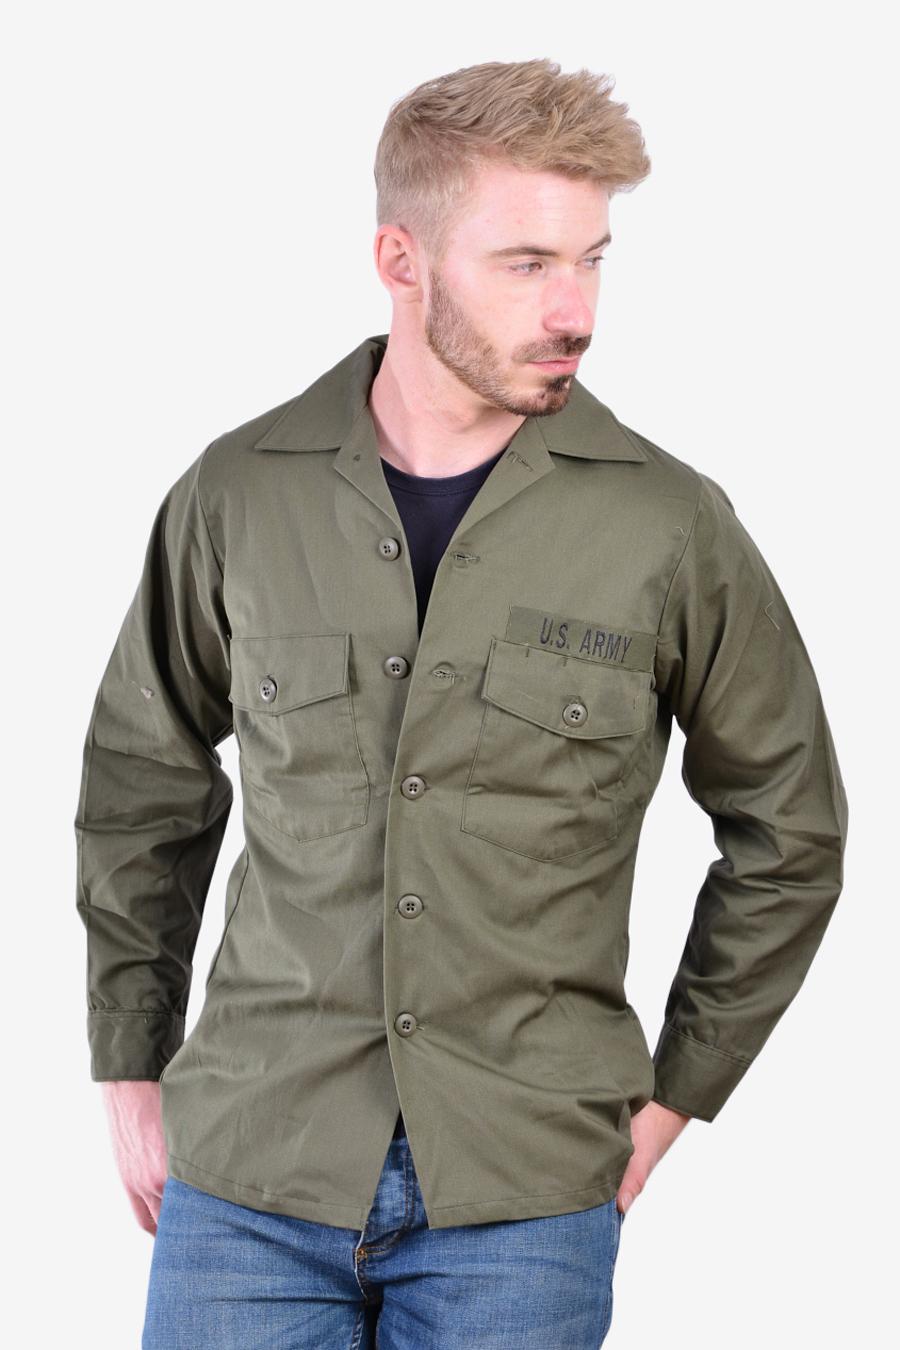 Vintage US Army OG Utility shirt